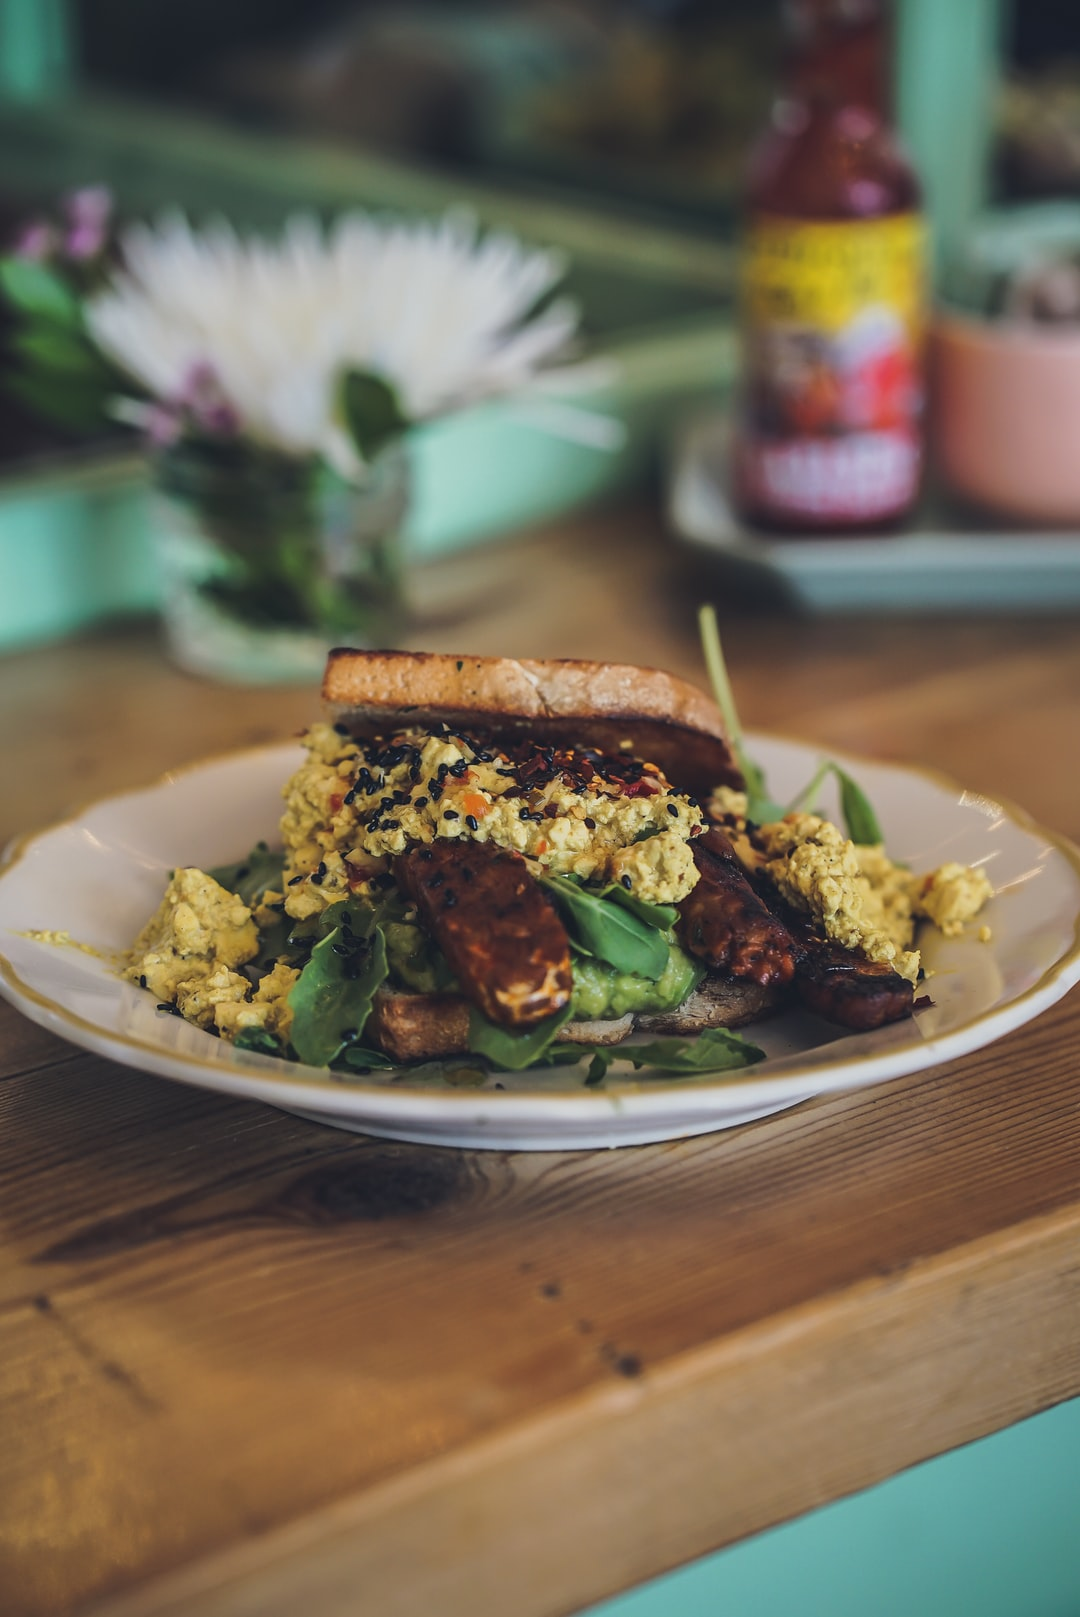 Eating a healthy vegan tempeh sandwich with scrambled tofu